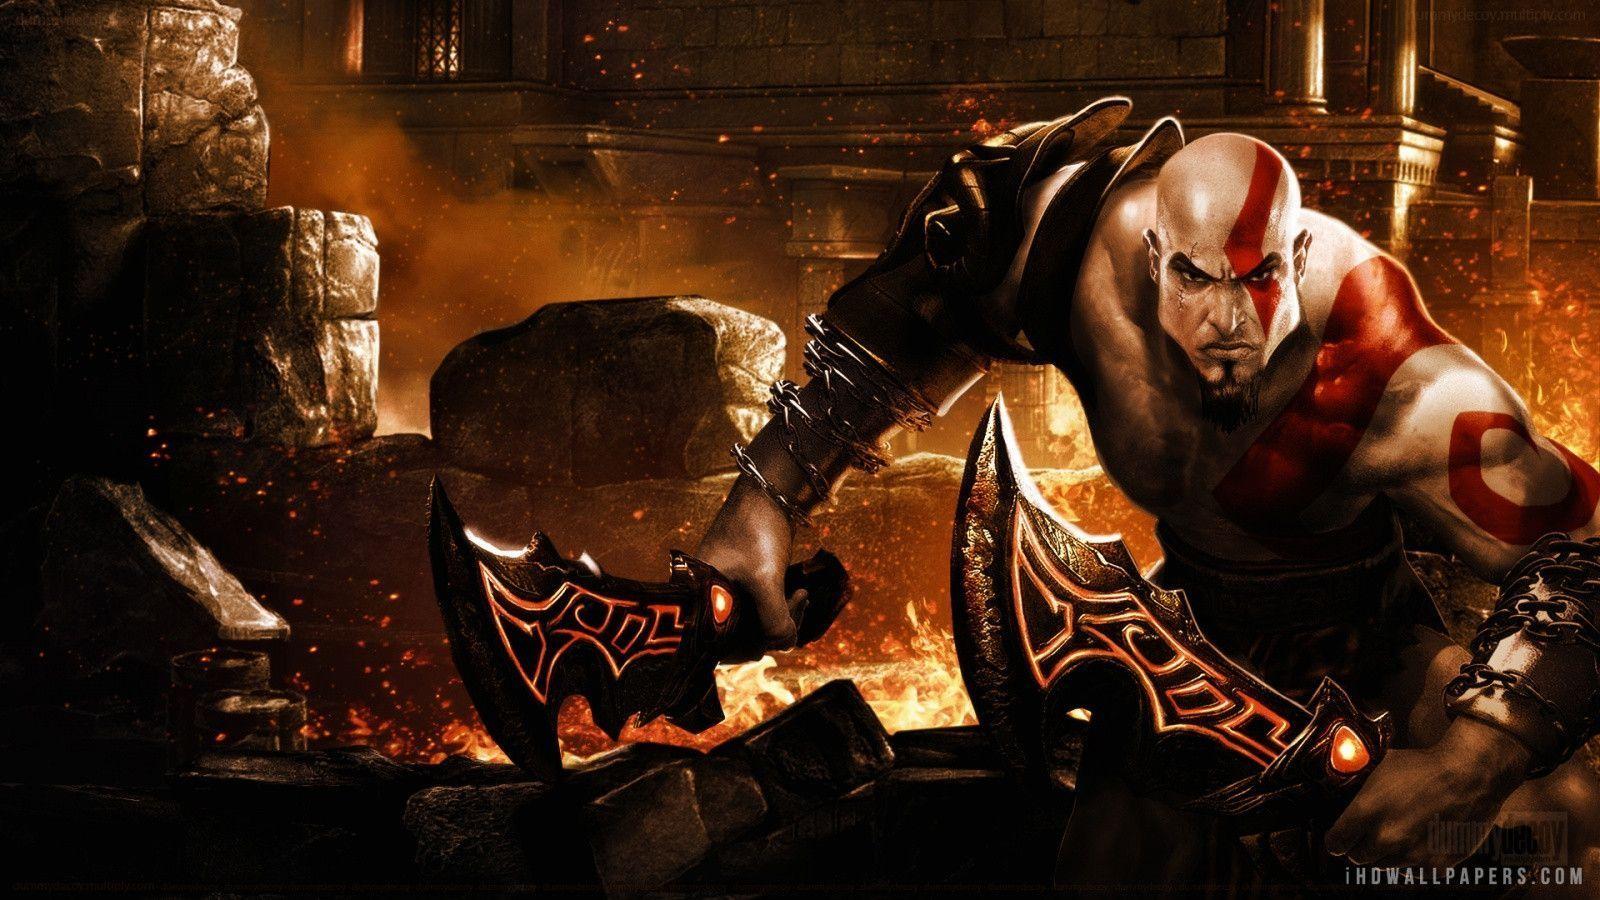 Kratos Wallpapers Hd Wallpaper Kratos God Of War God Of War Kratos God Of War Wallpapers